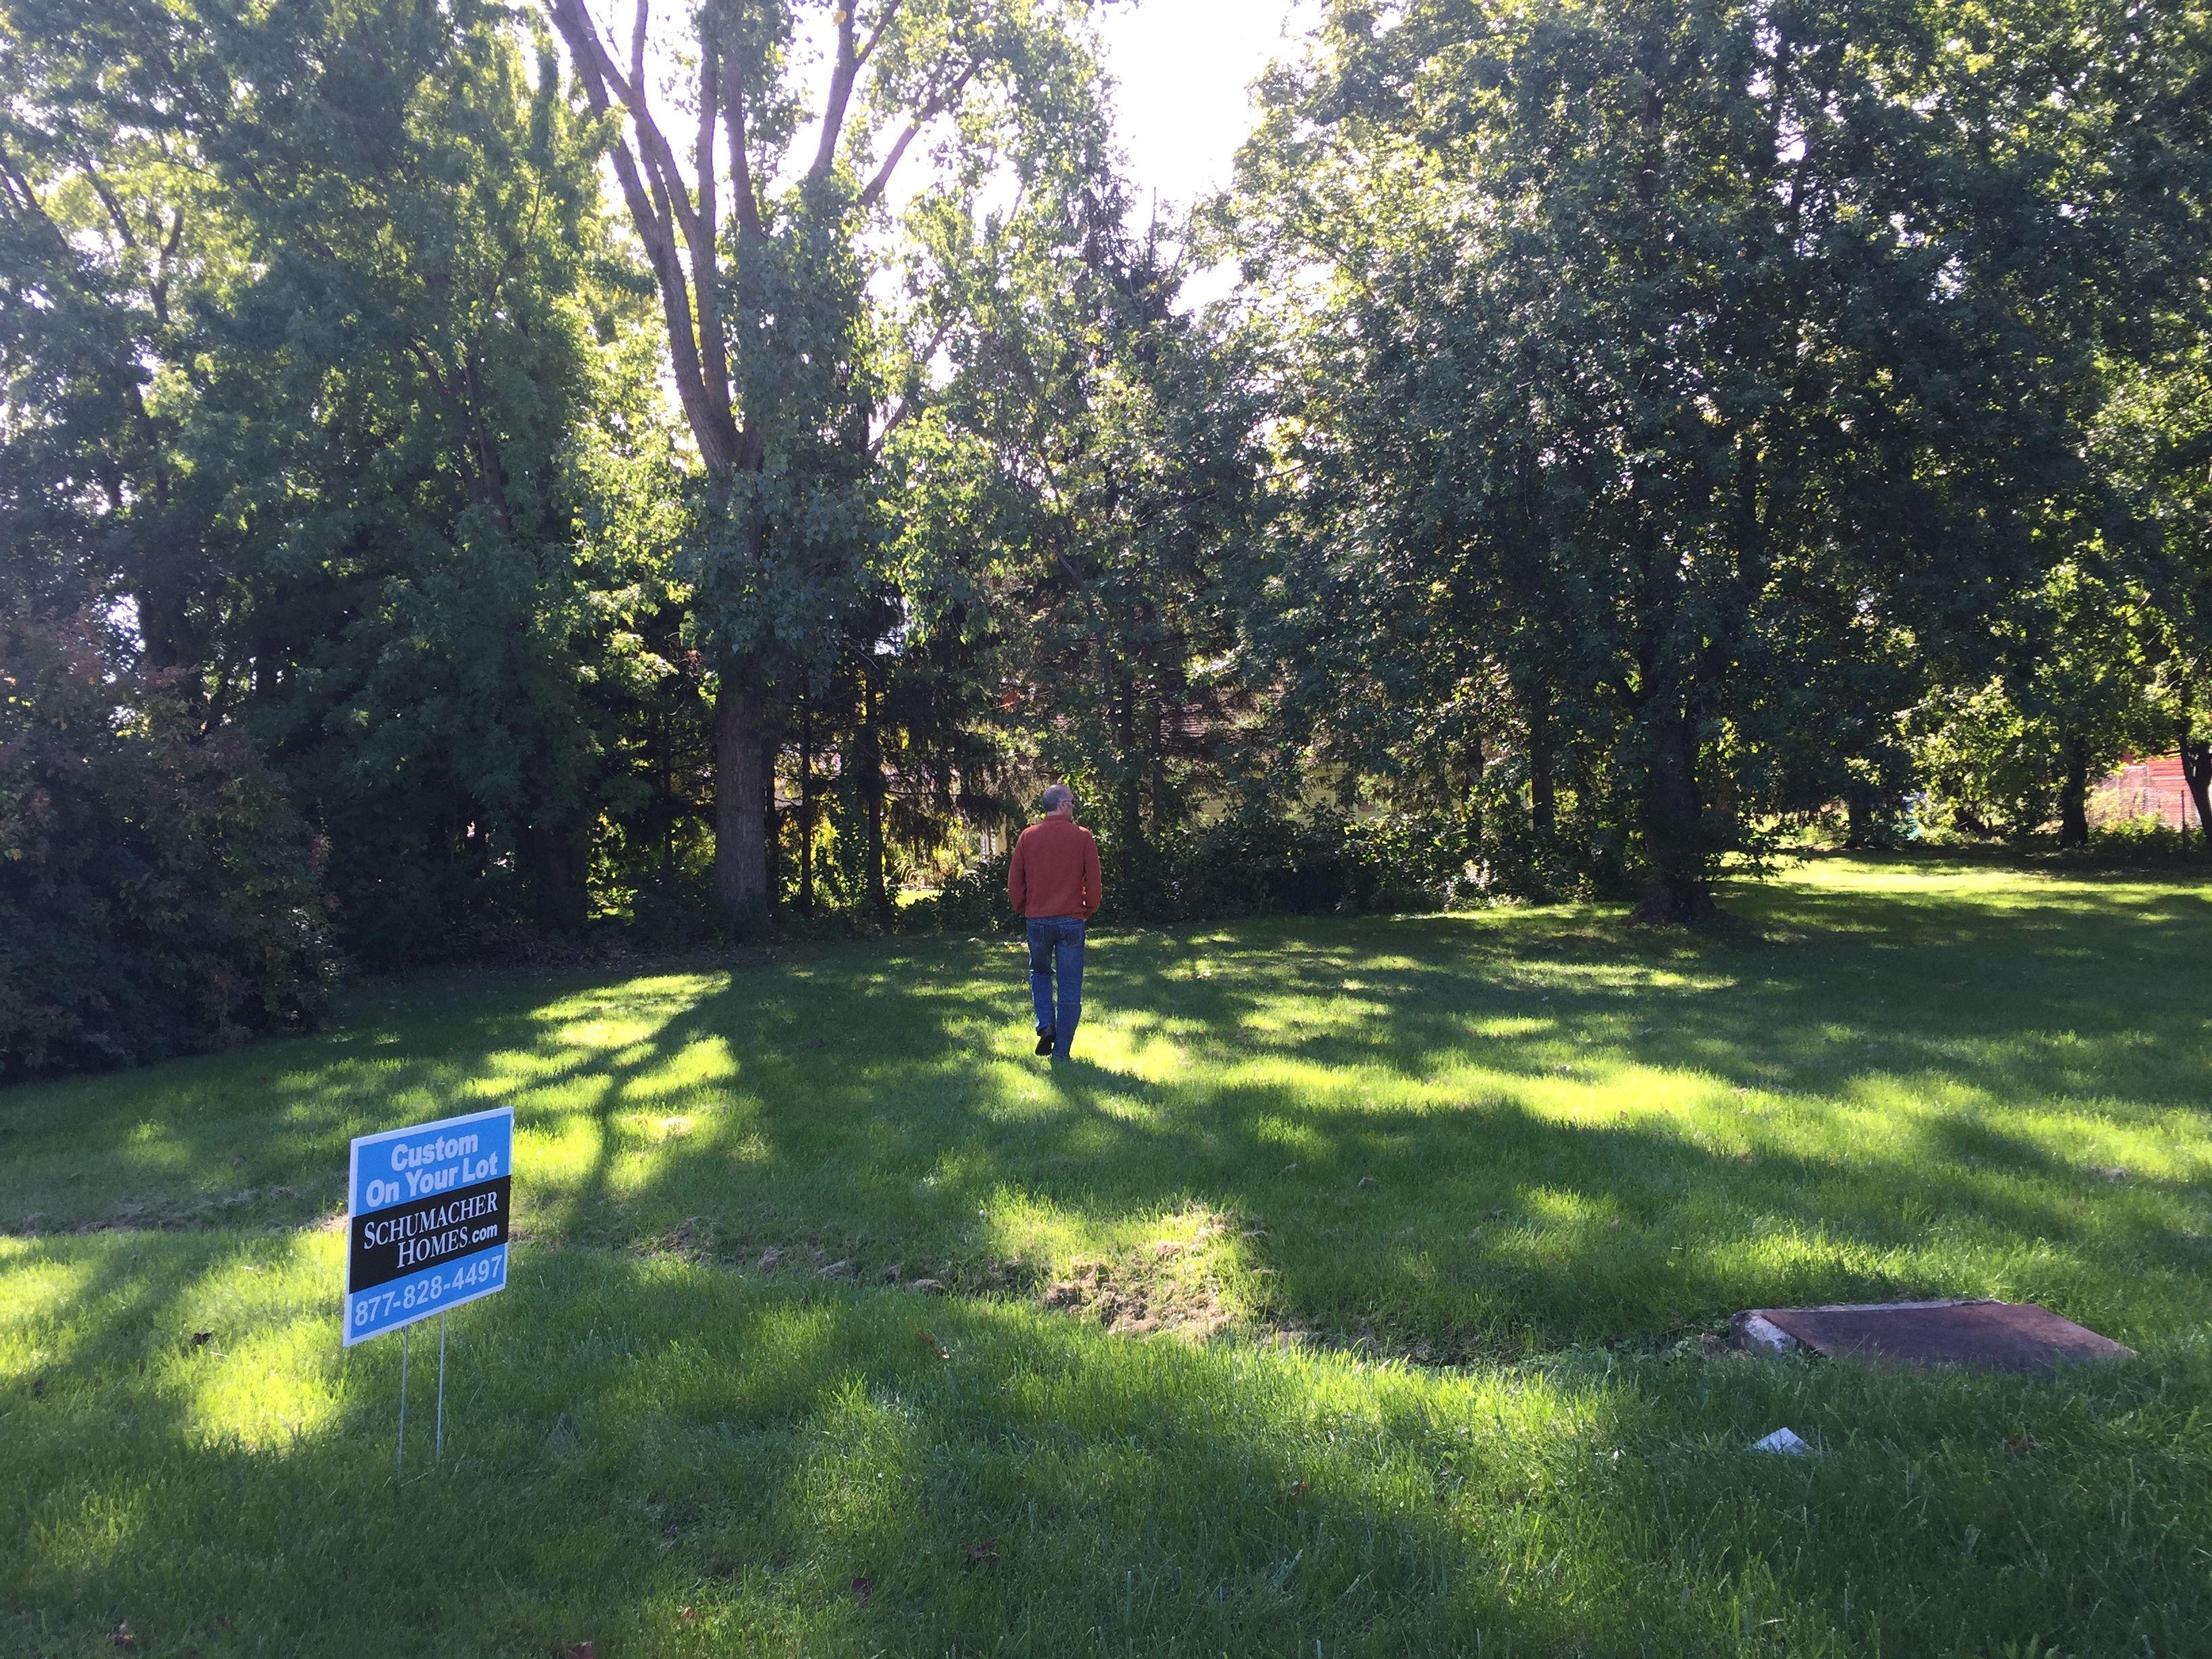 Pin by tina tamburrino on 505 huron street golf courses